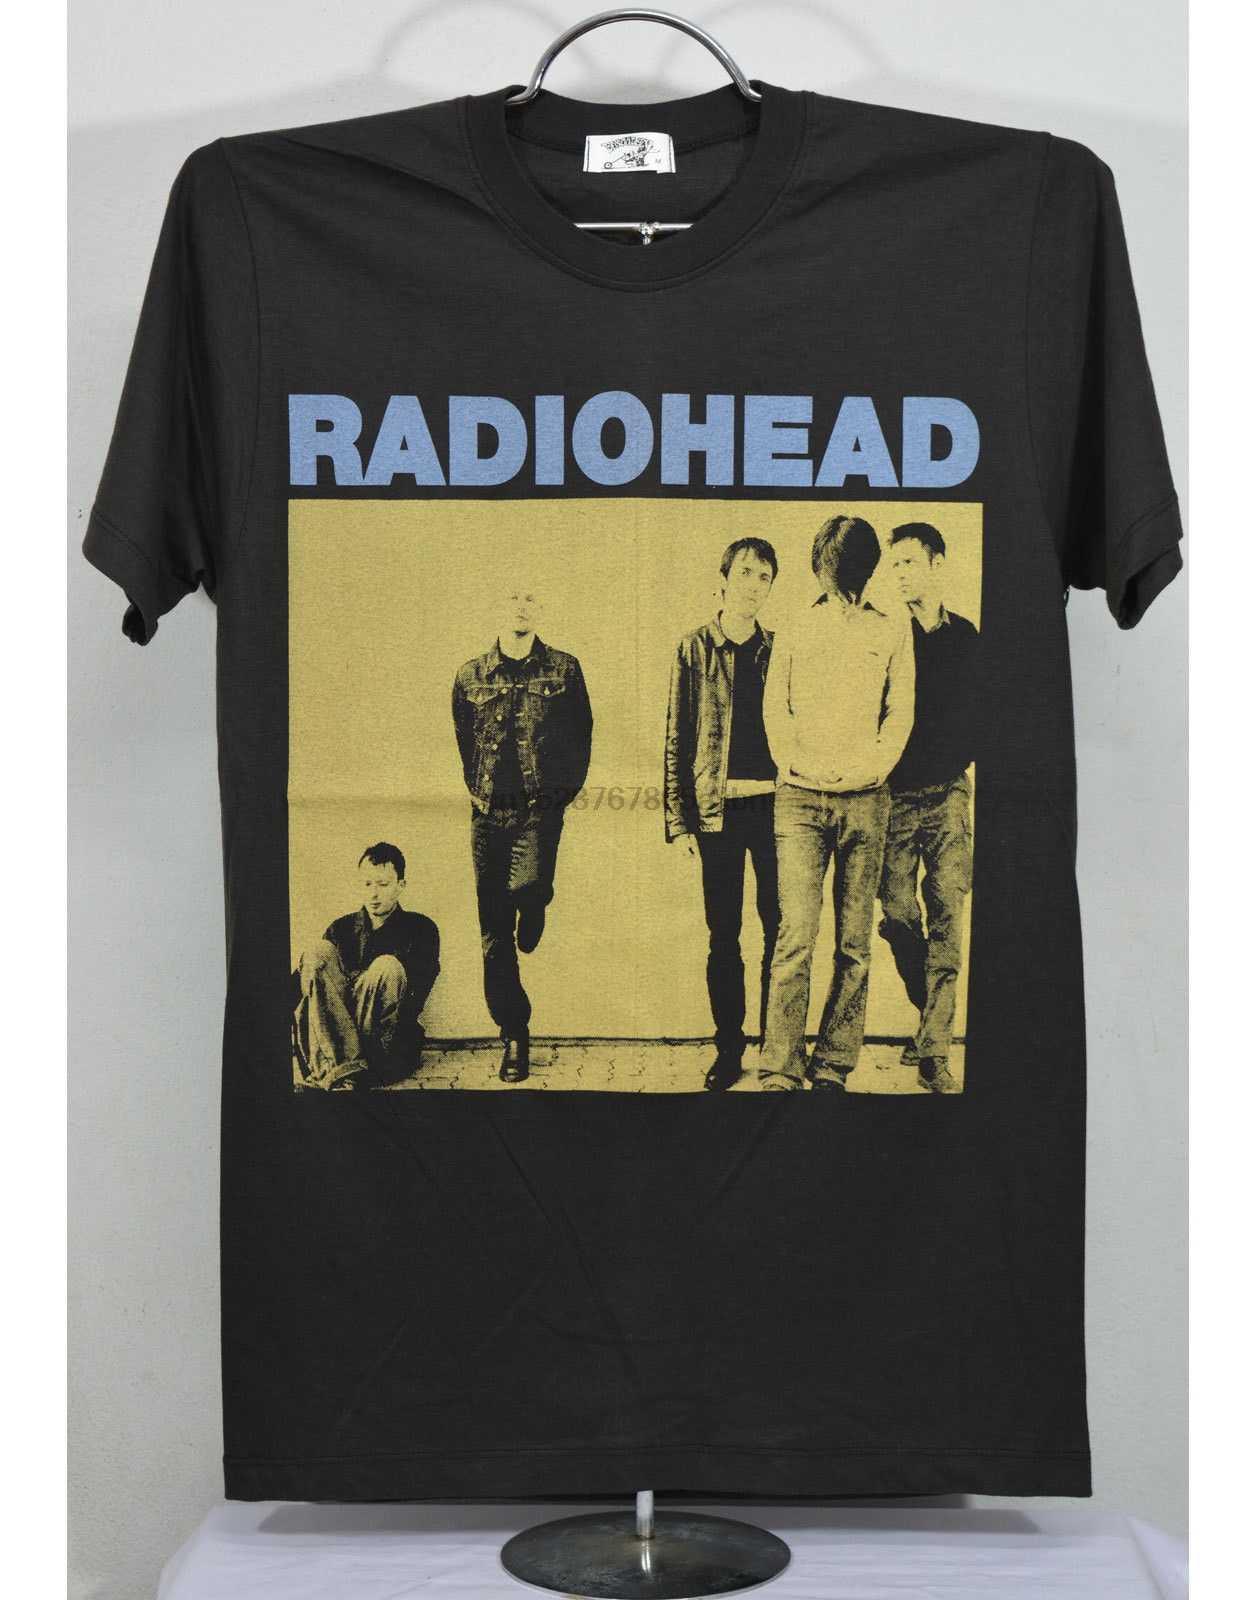 RADIOHEAD T-Shirt Black Rock Band Concert Vtg New Summer Short Sleeves Fashion